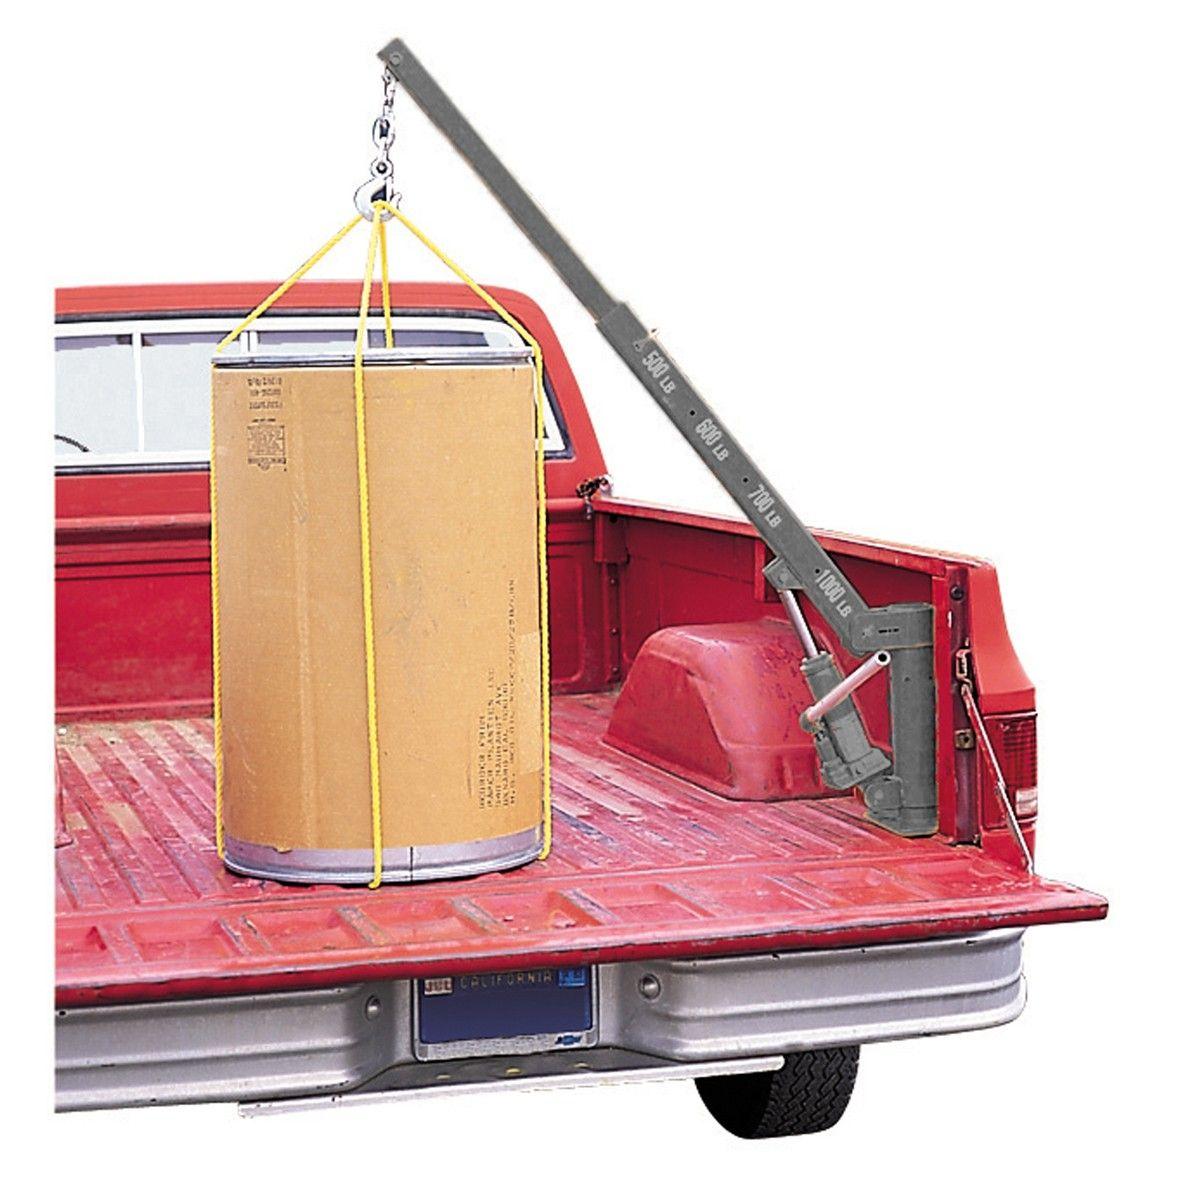 Pickup Truck Bed Crane 1000 lb. Capacity in 2020